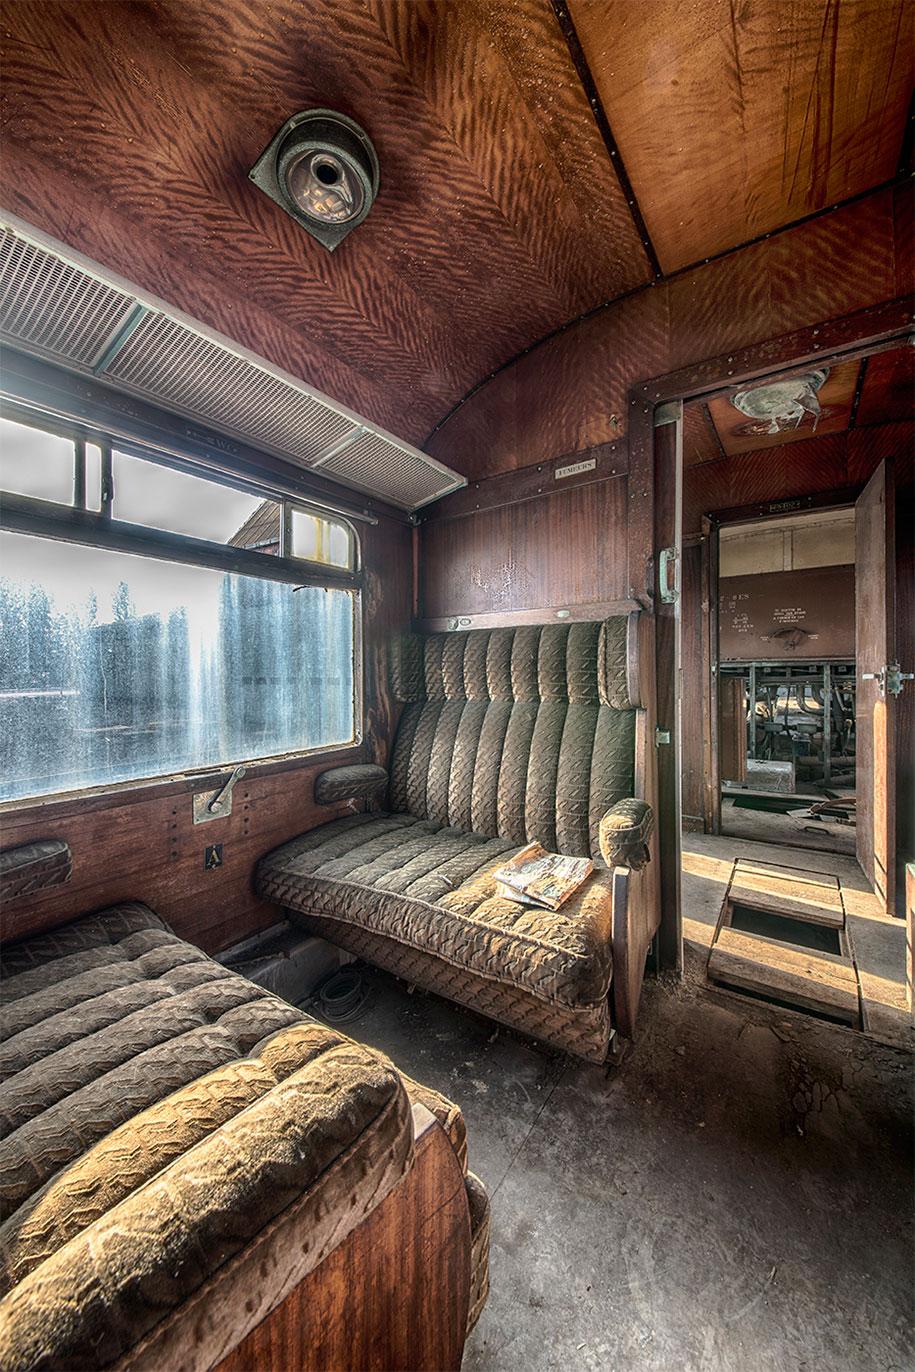 abandoned-train-orient-express-urban-exploration-brian-belgium-1